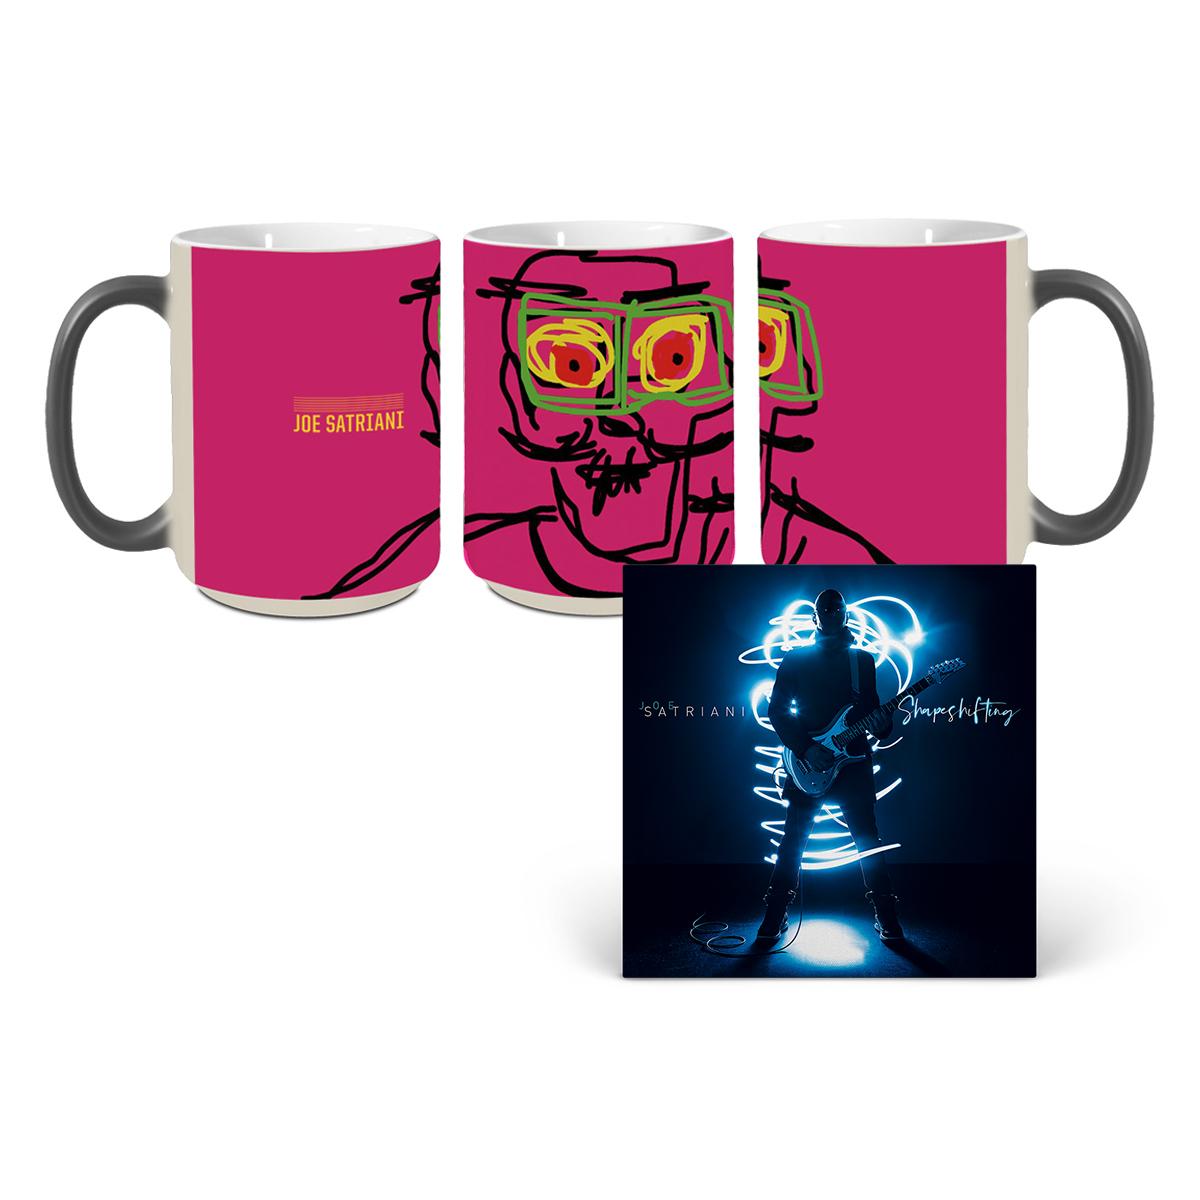 Joe Satriani: Shapeshifting Album + Original Artwork Ceramic Reveal Mug